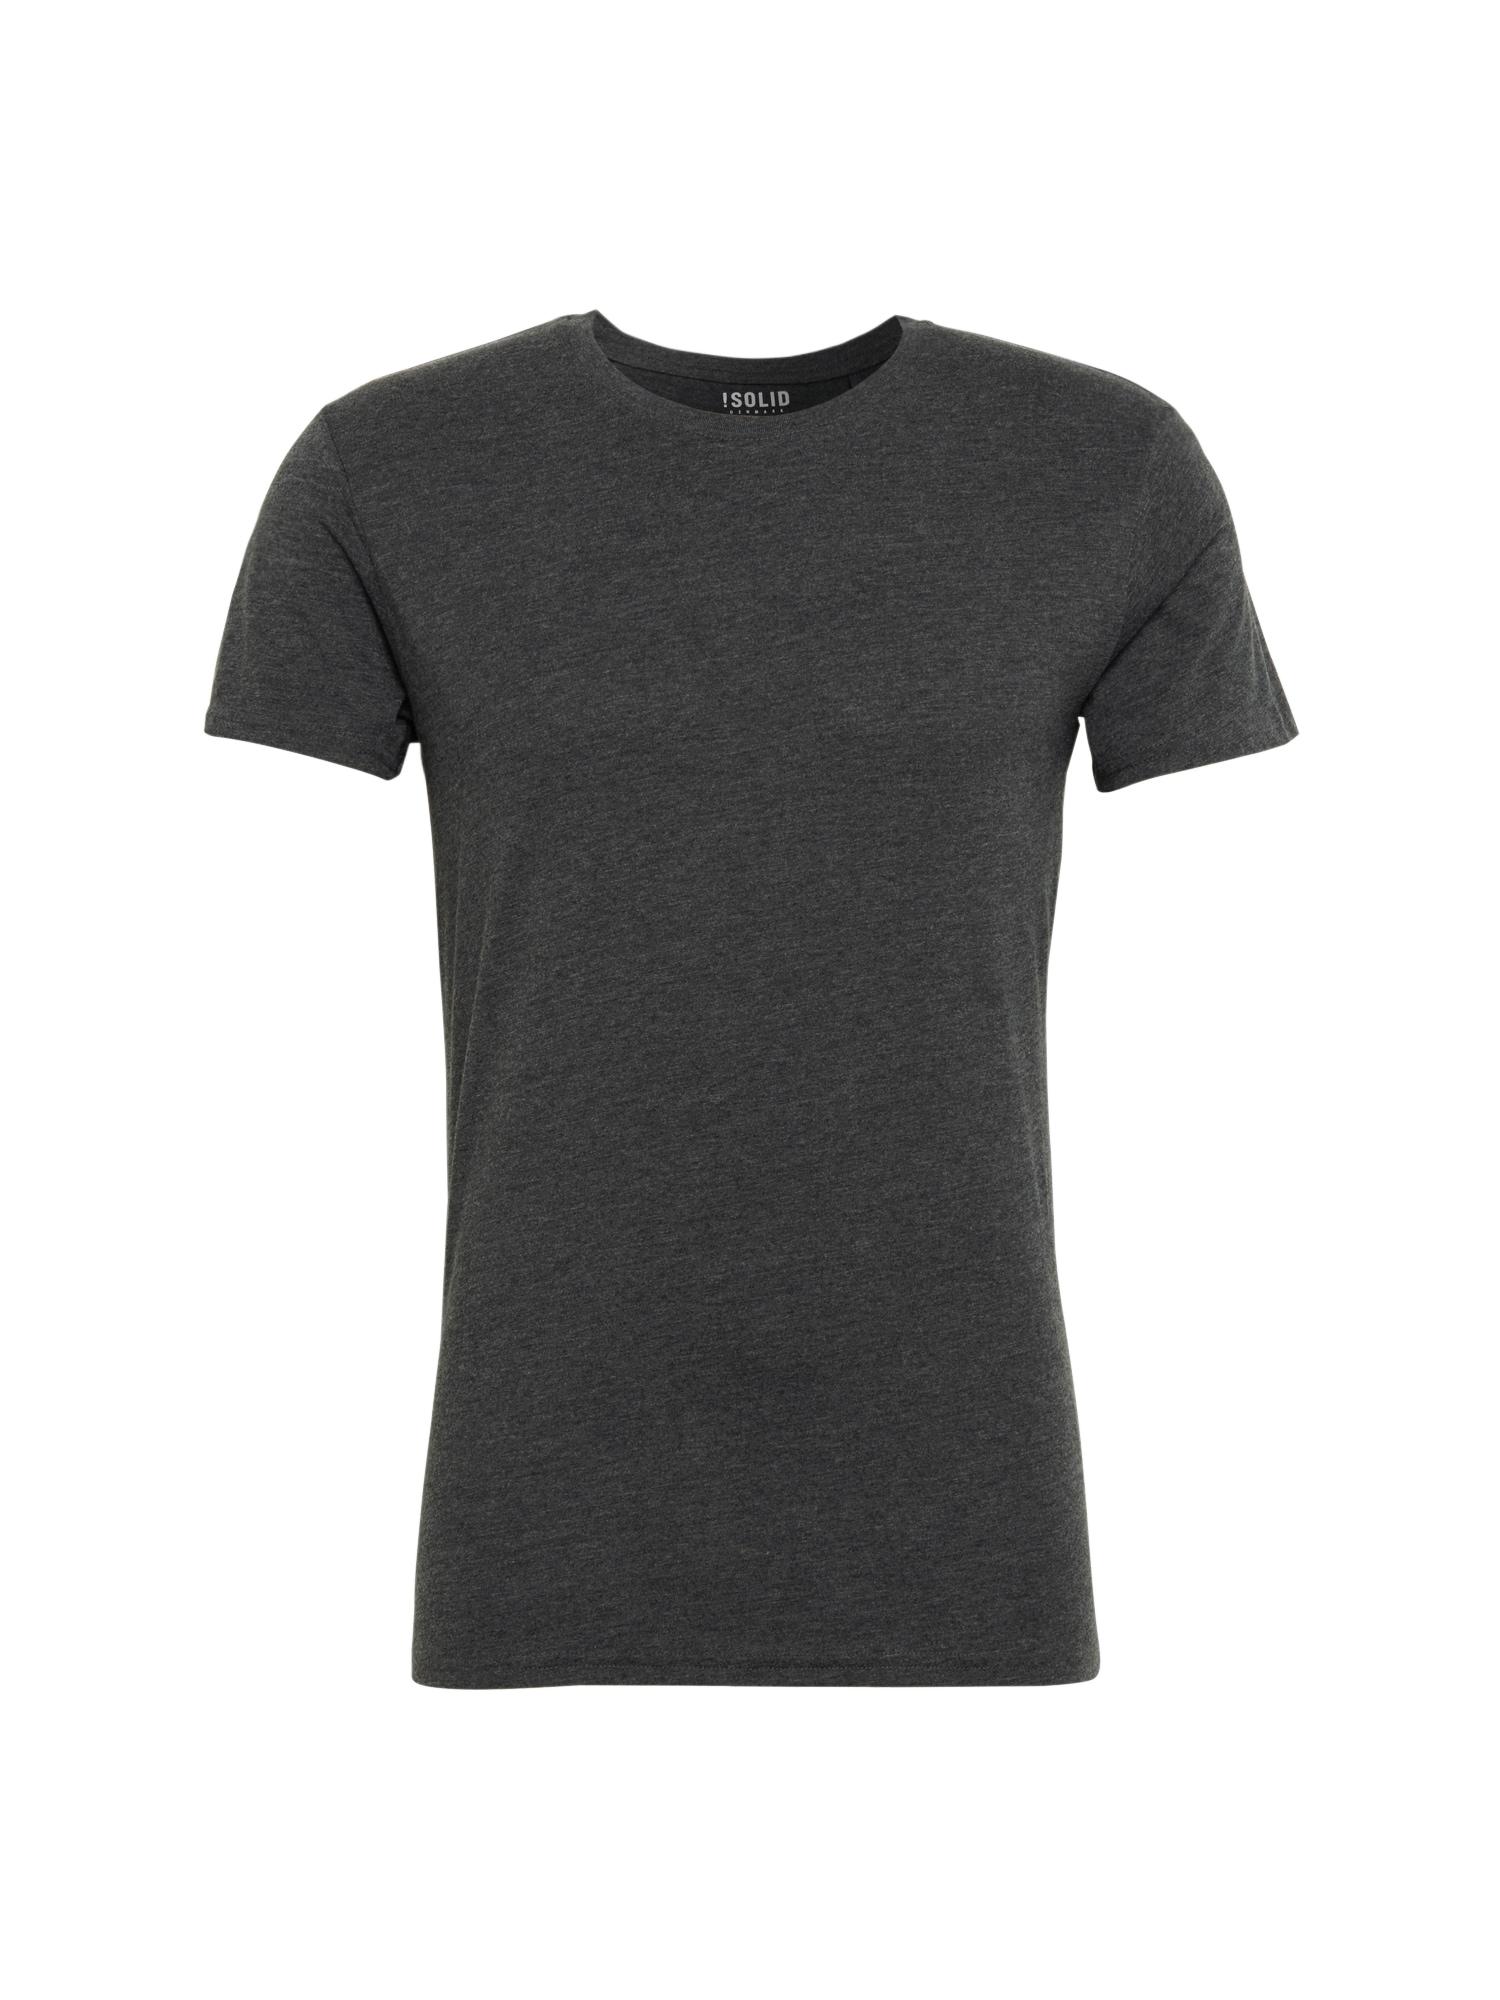 Tričko Rock Melange tmavě šedá !Solid